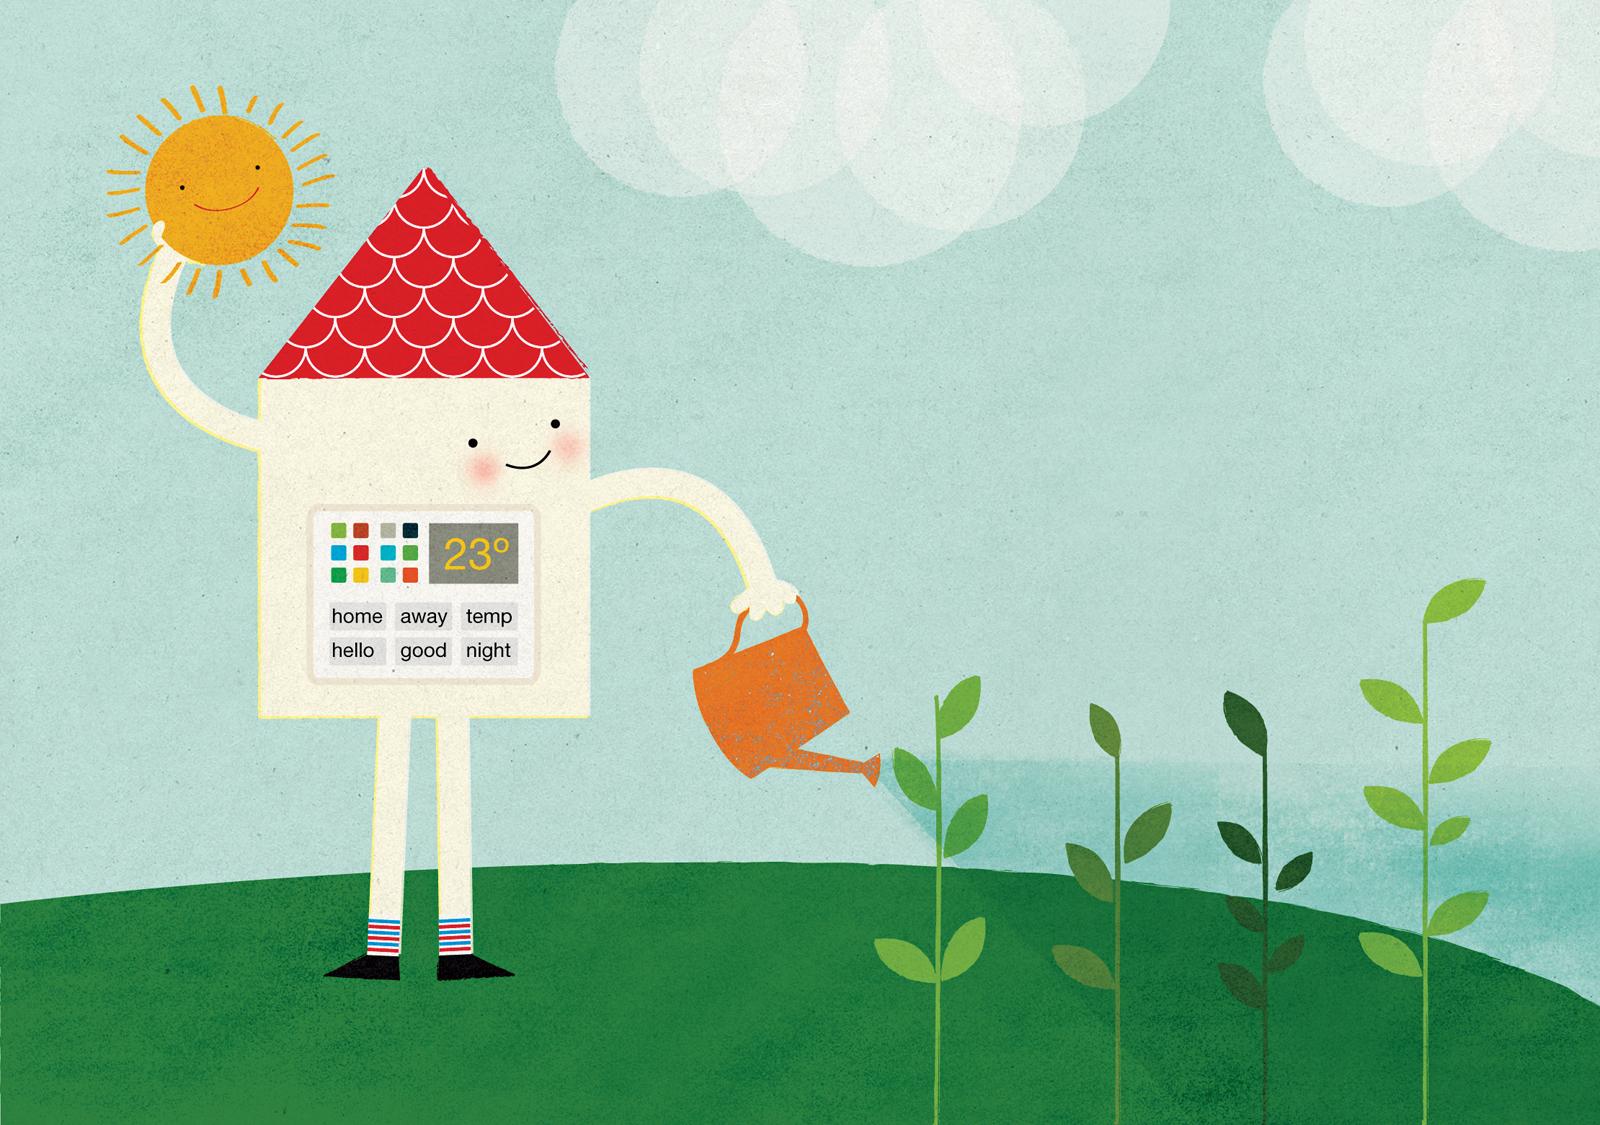 home smart home gardening